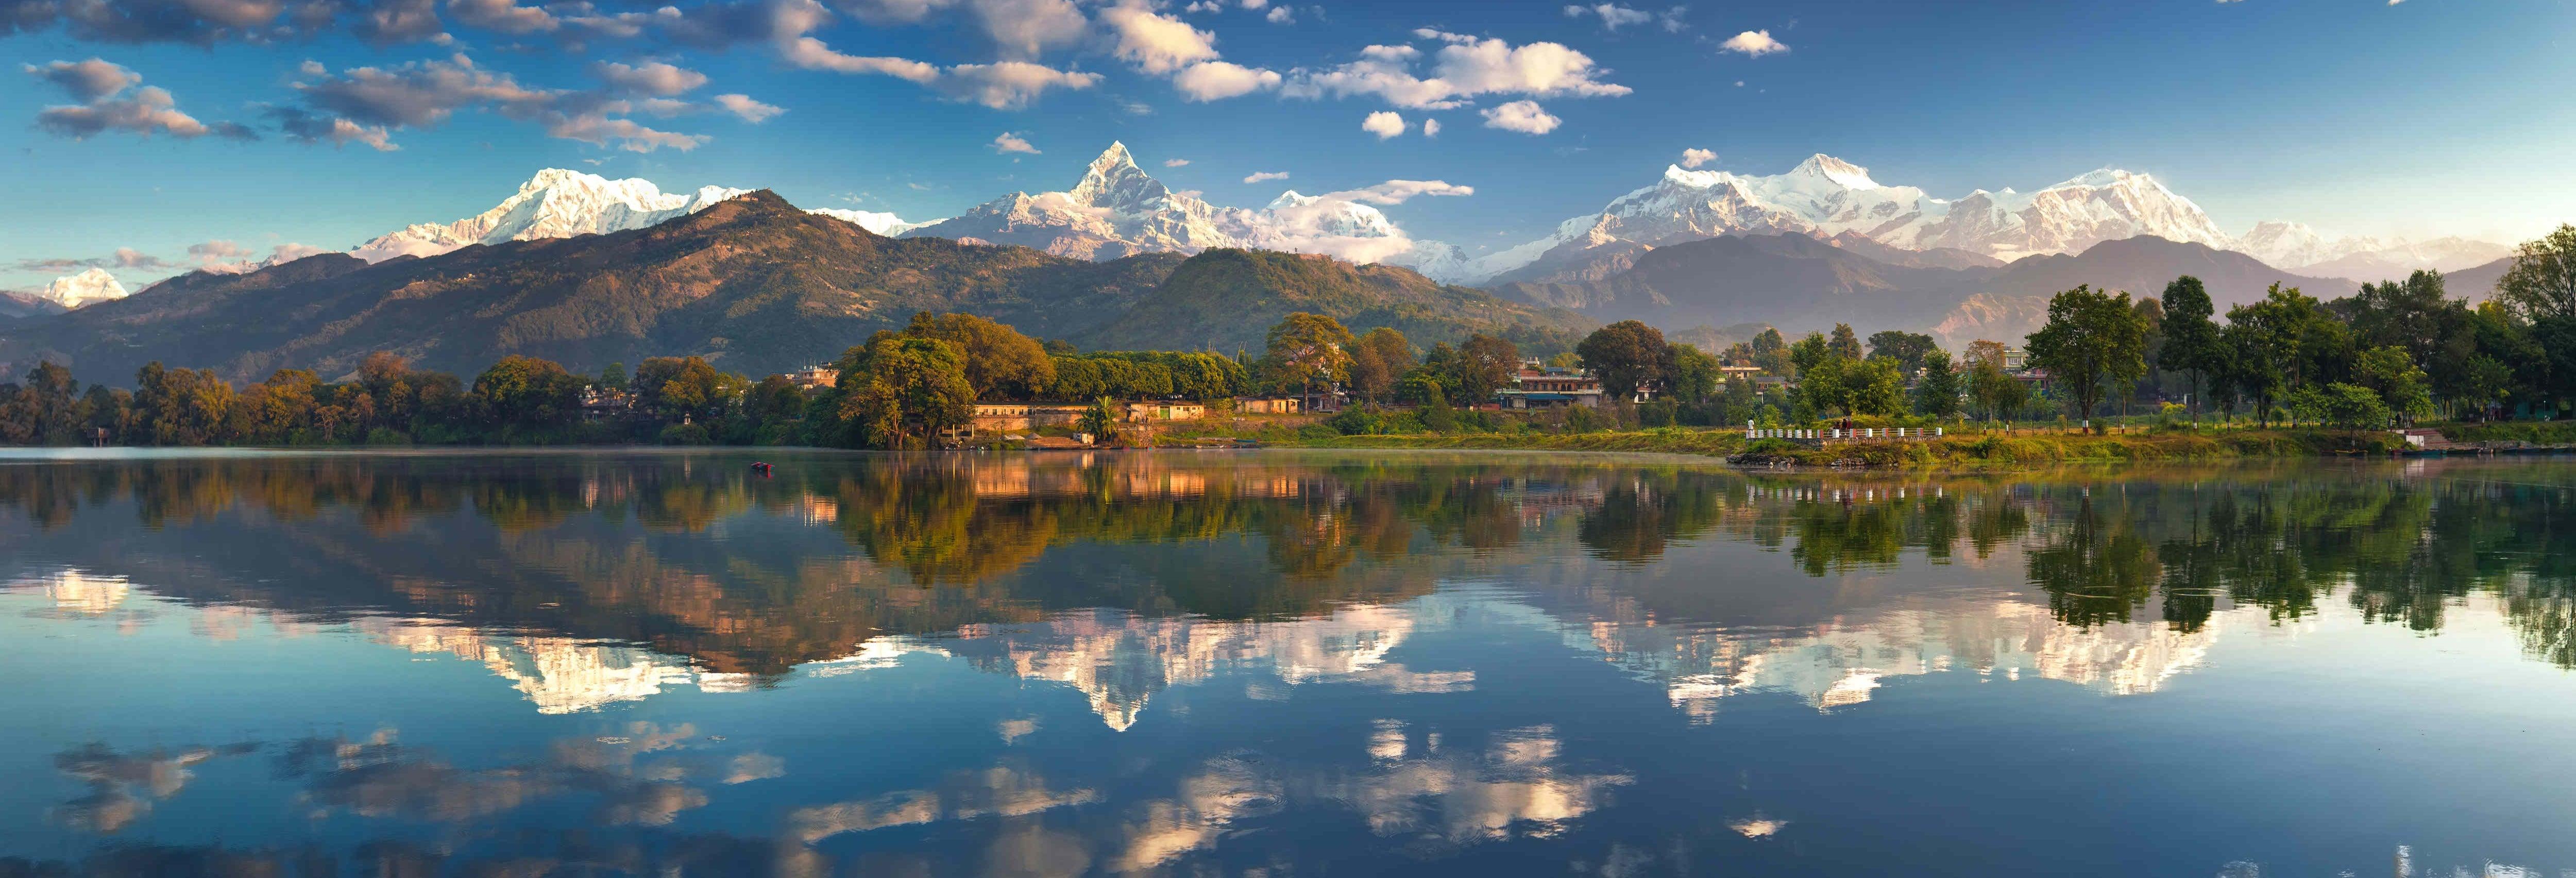 Visite dans Pokhara